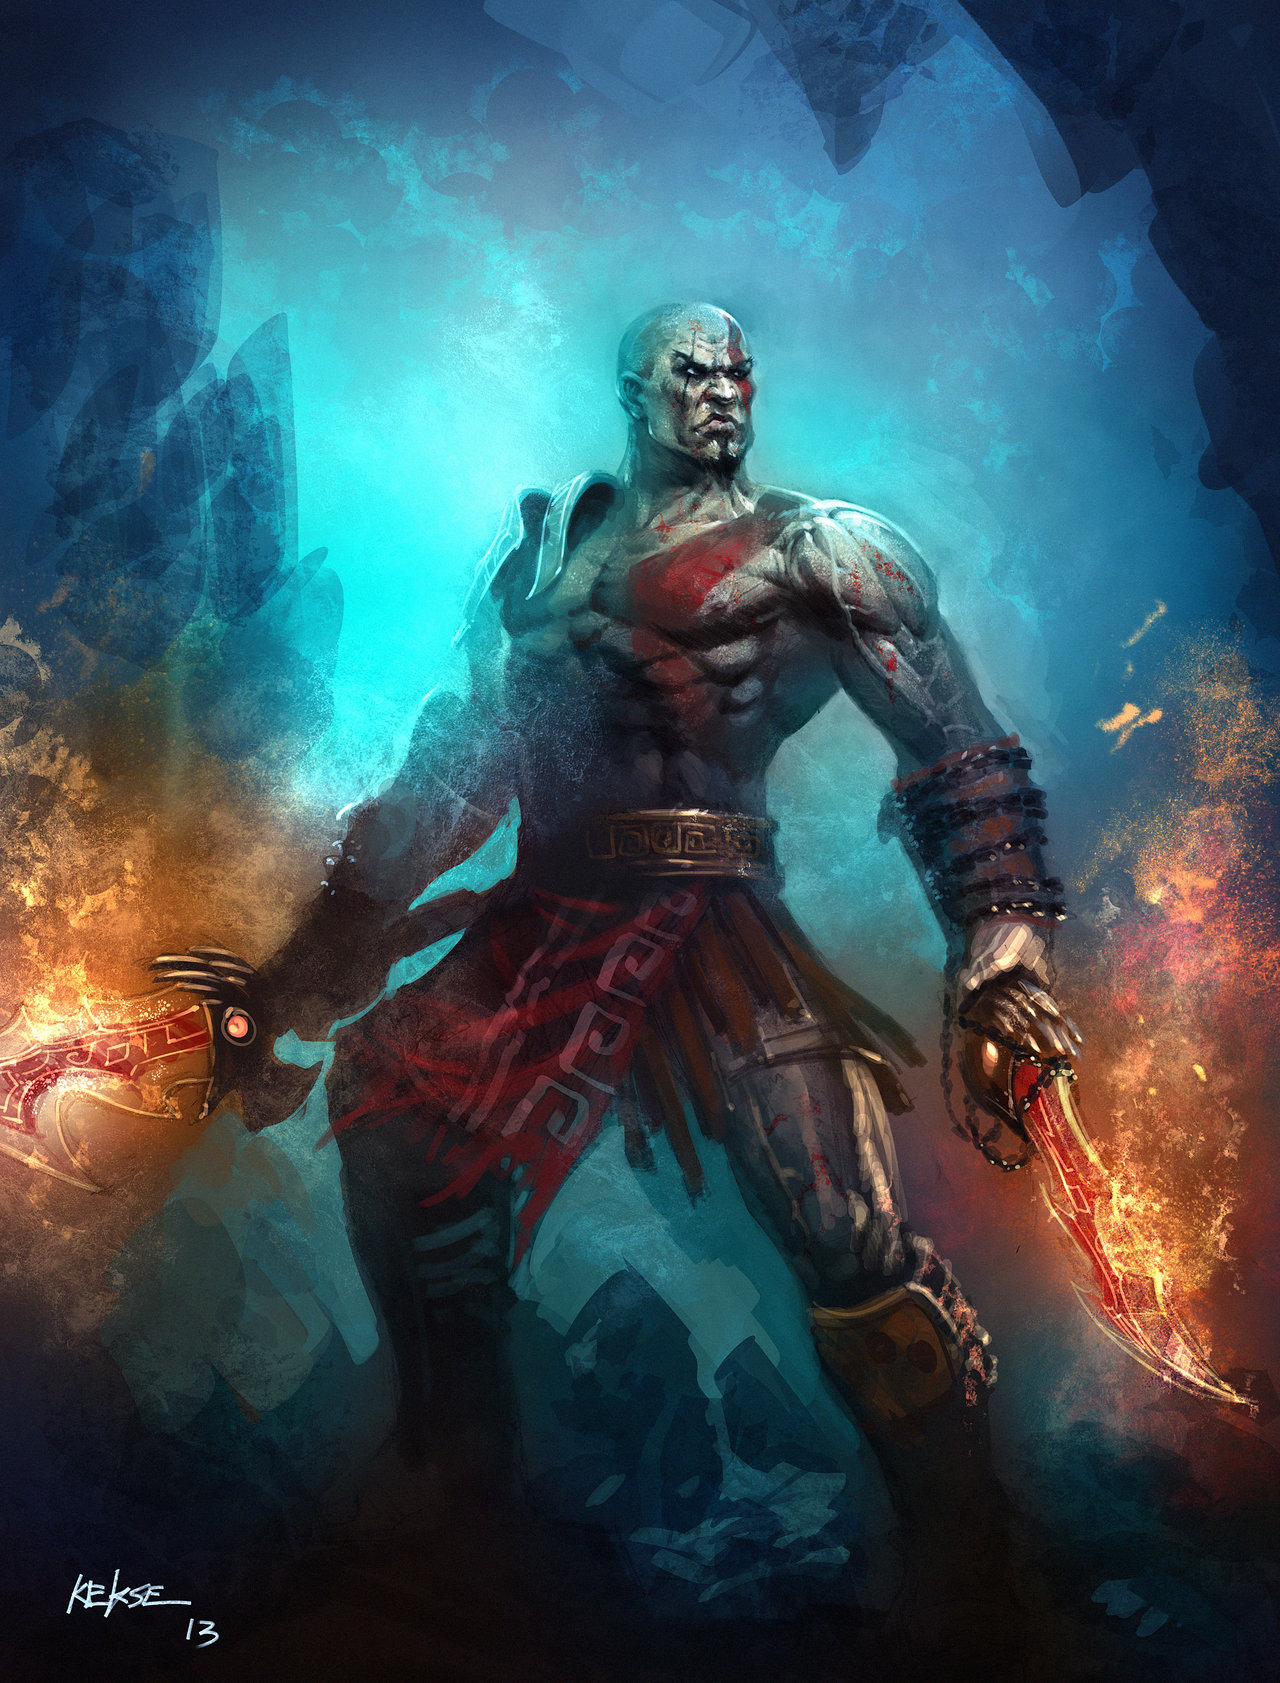 kratos_by_kekse0719-d6mi1cl